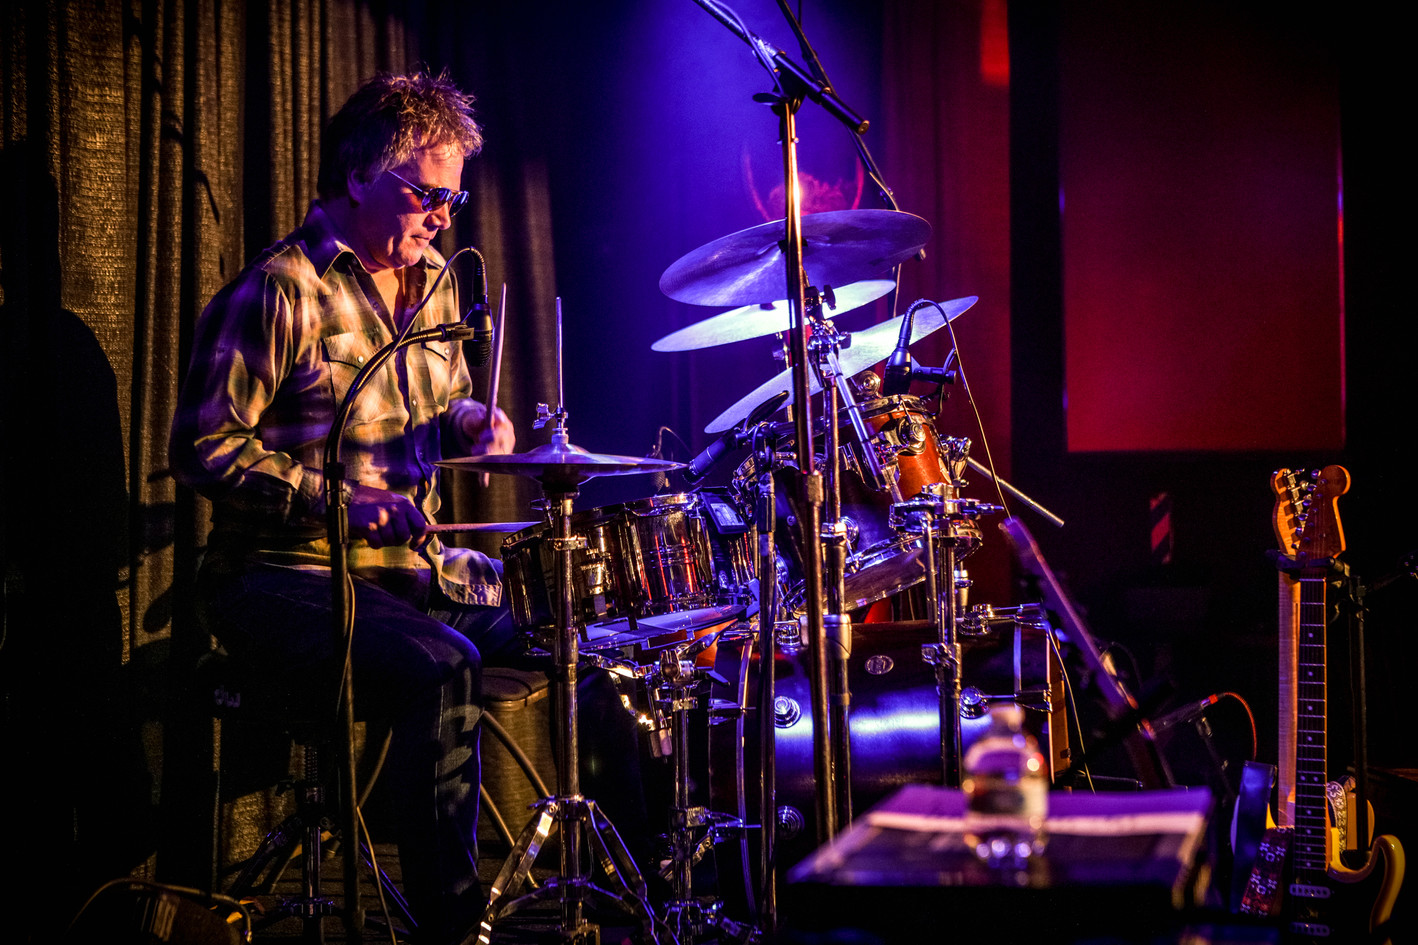 Eric Kalb of The Scott Sharrard Band